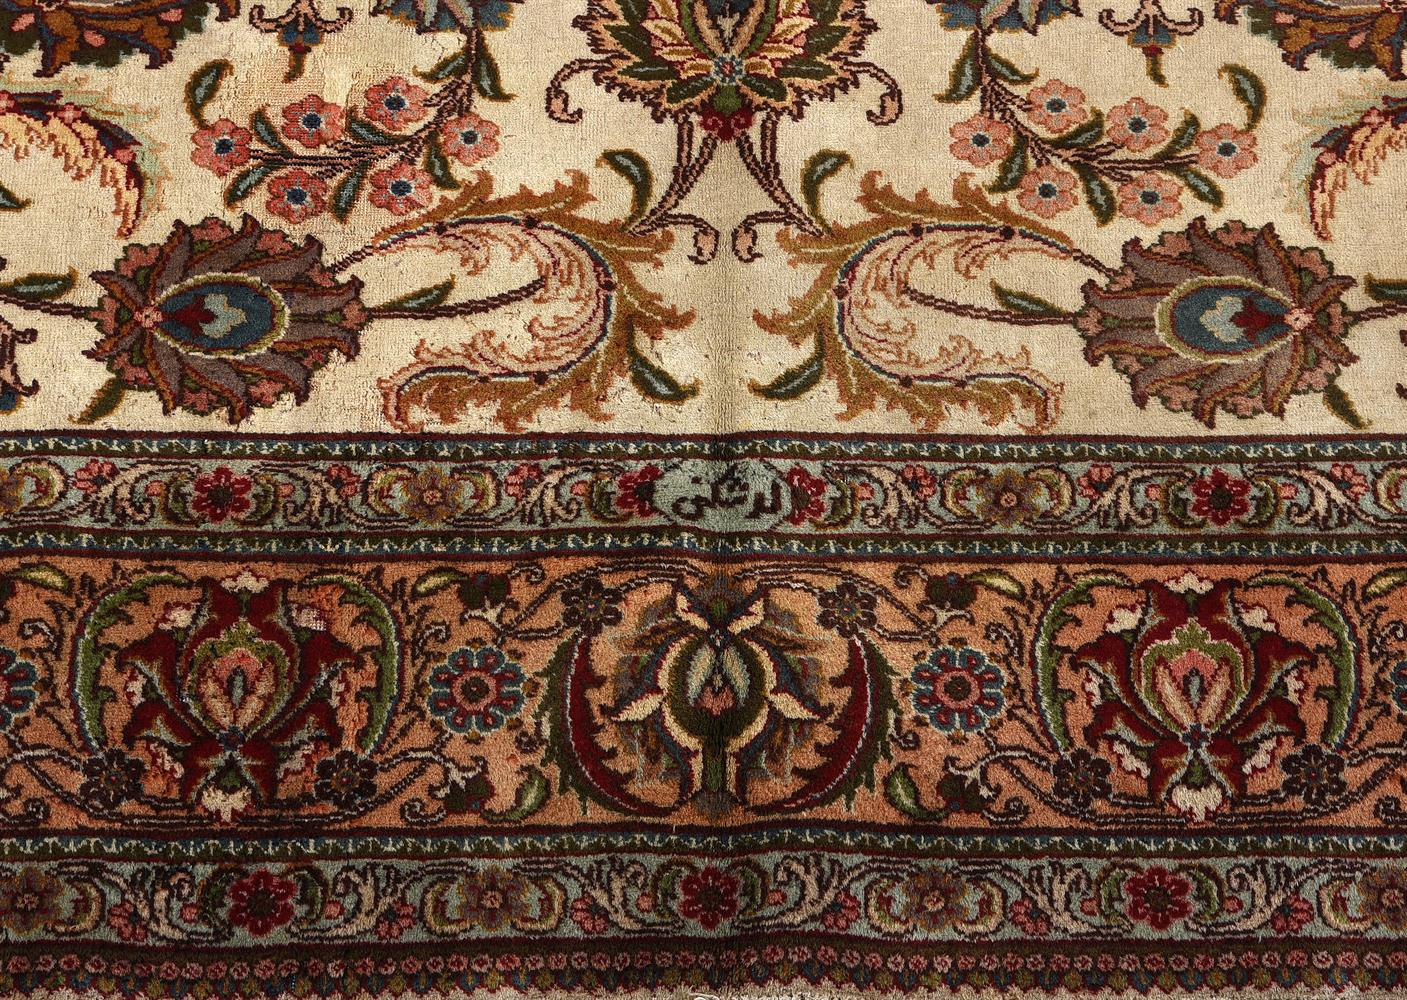 A TABRIZ CARPET, approximately 426 x 320 cm - Image 3 of 3